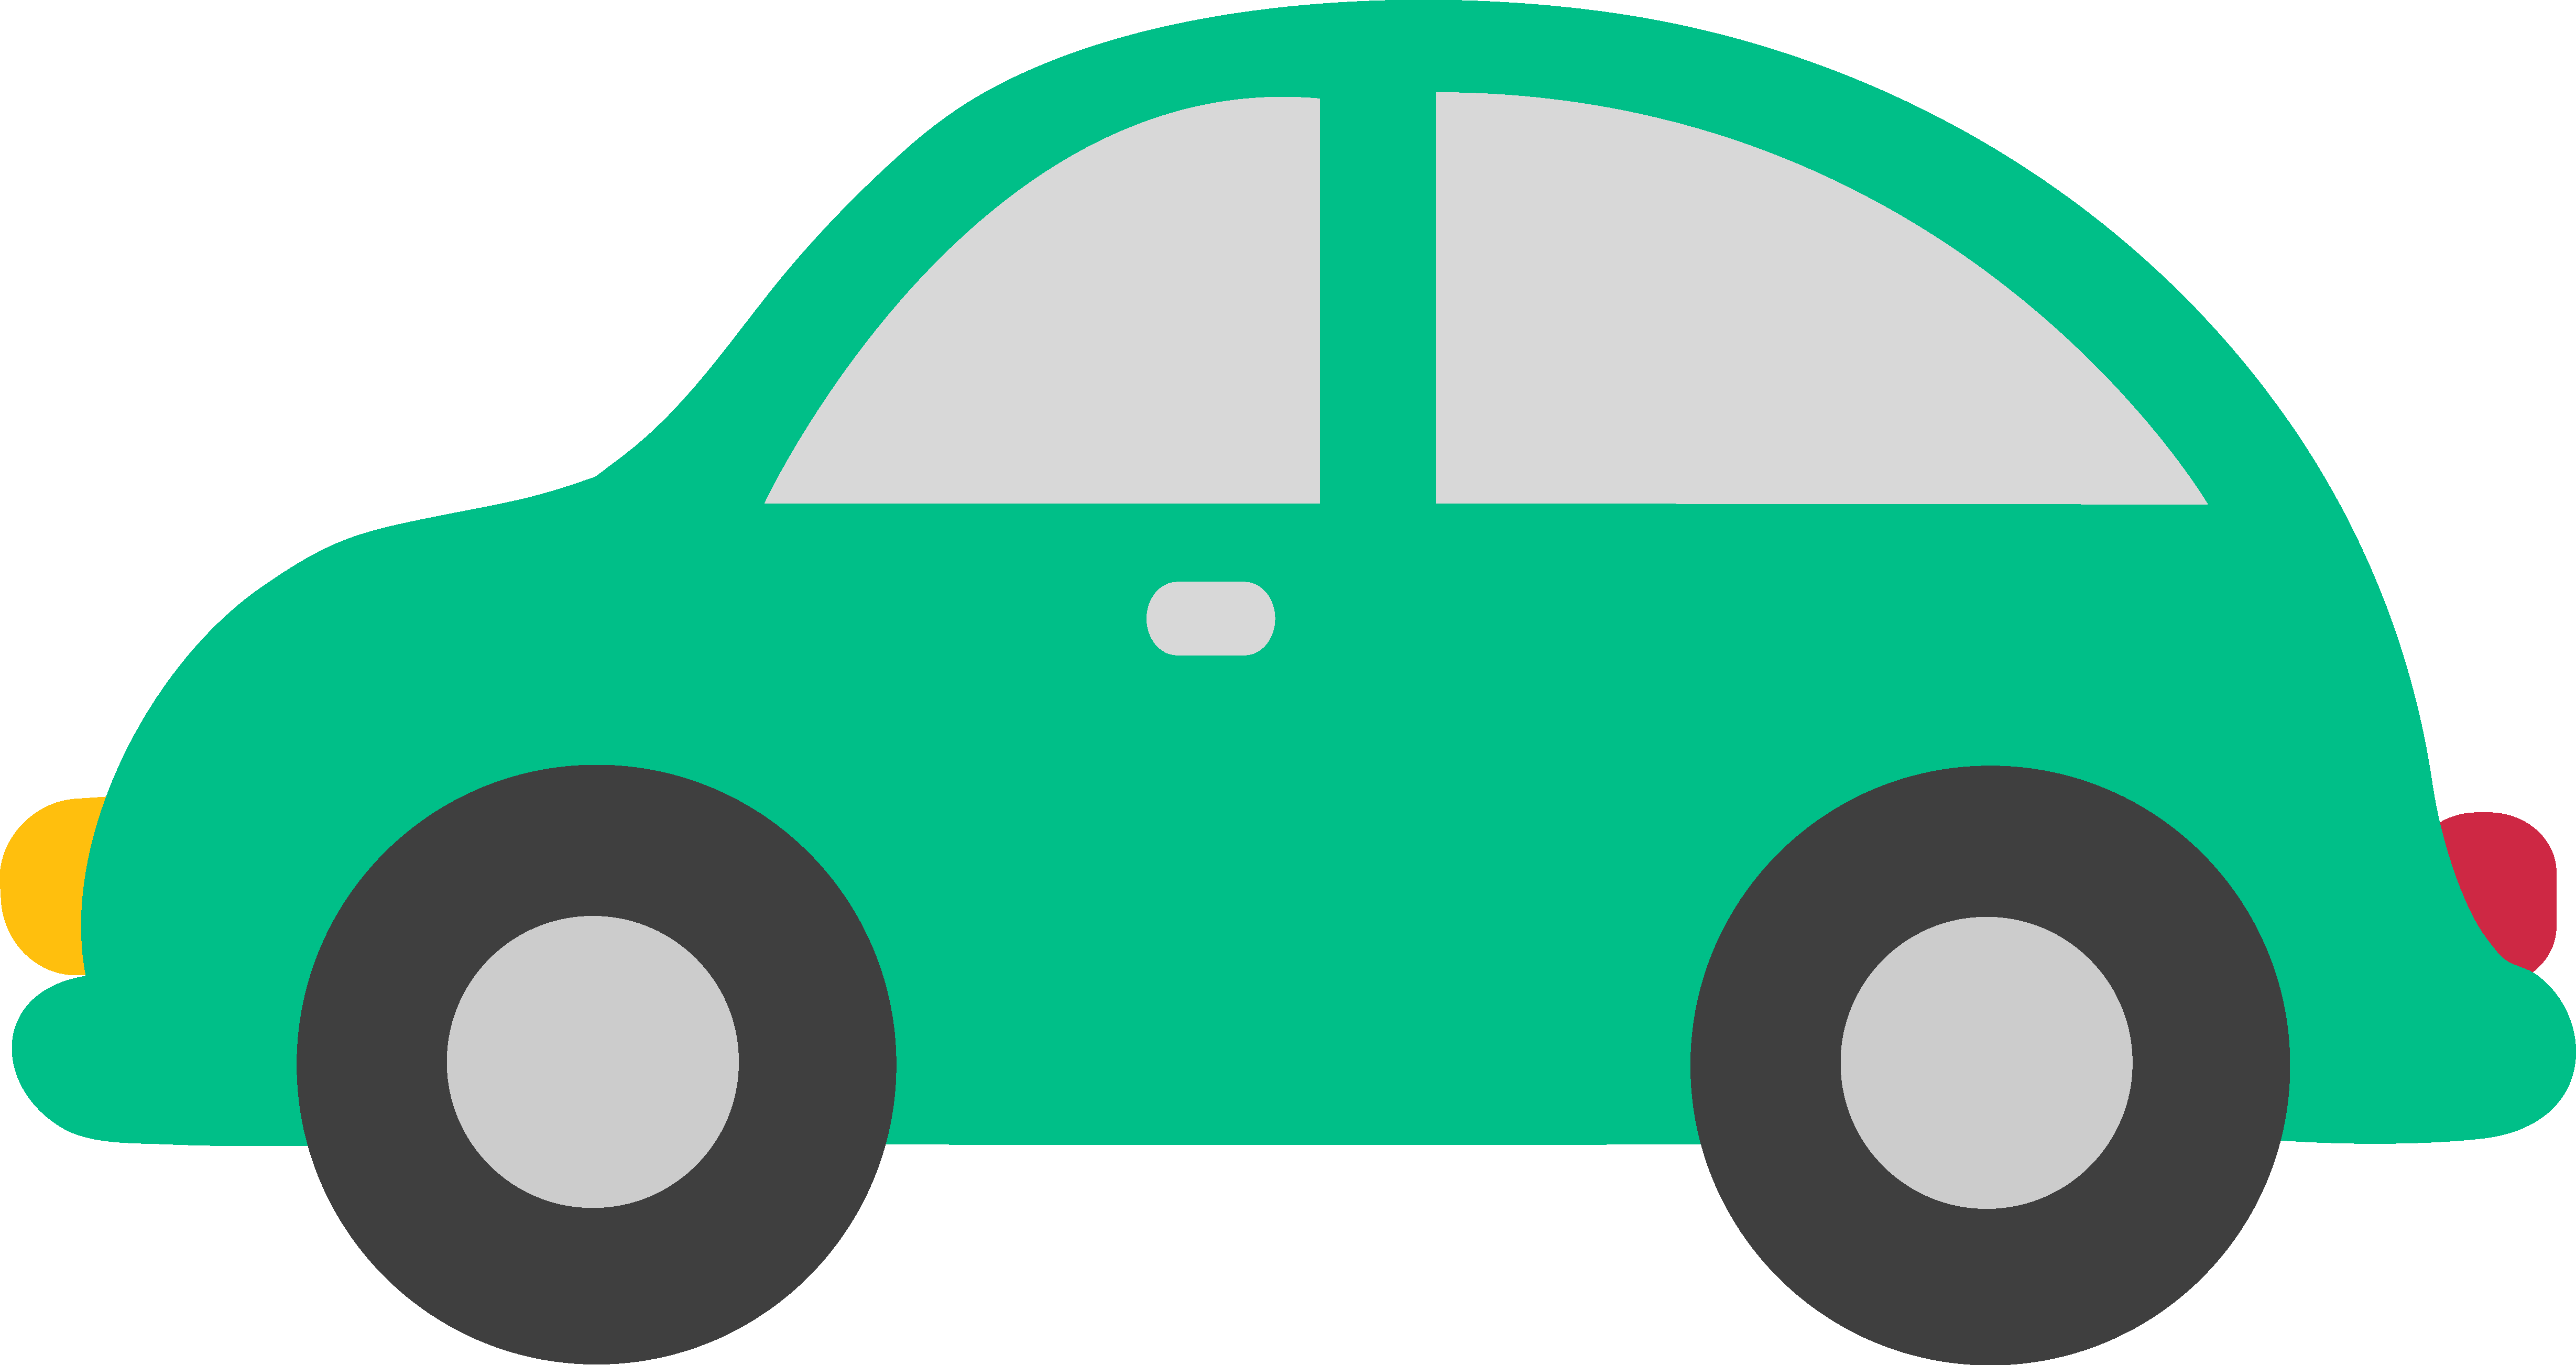 4916x2605 Free Clicpart Cartoon Cars Clipart The Cliparts Who's Silhouette